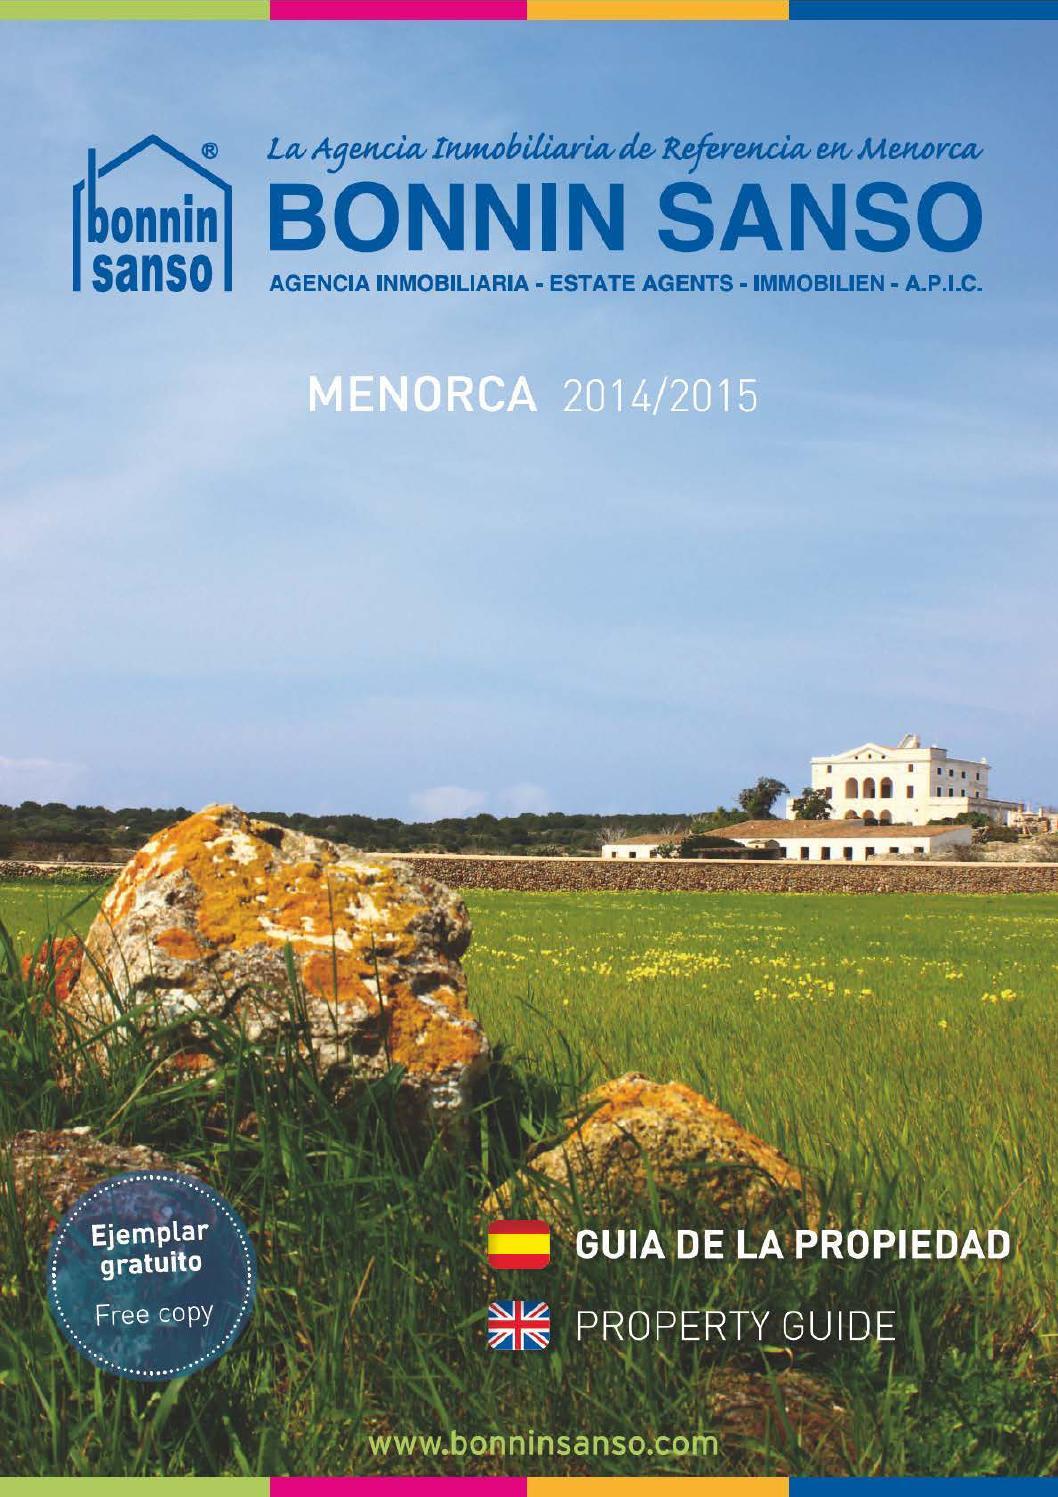 Property guide menorca 2014 by bonnin sanso estate agents issuu - Bonnin sanso menorca ...